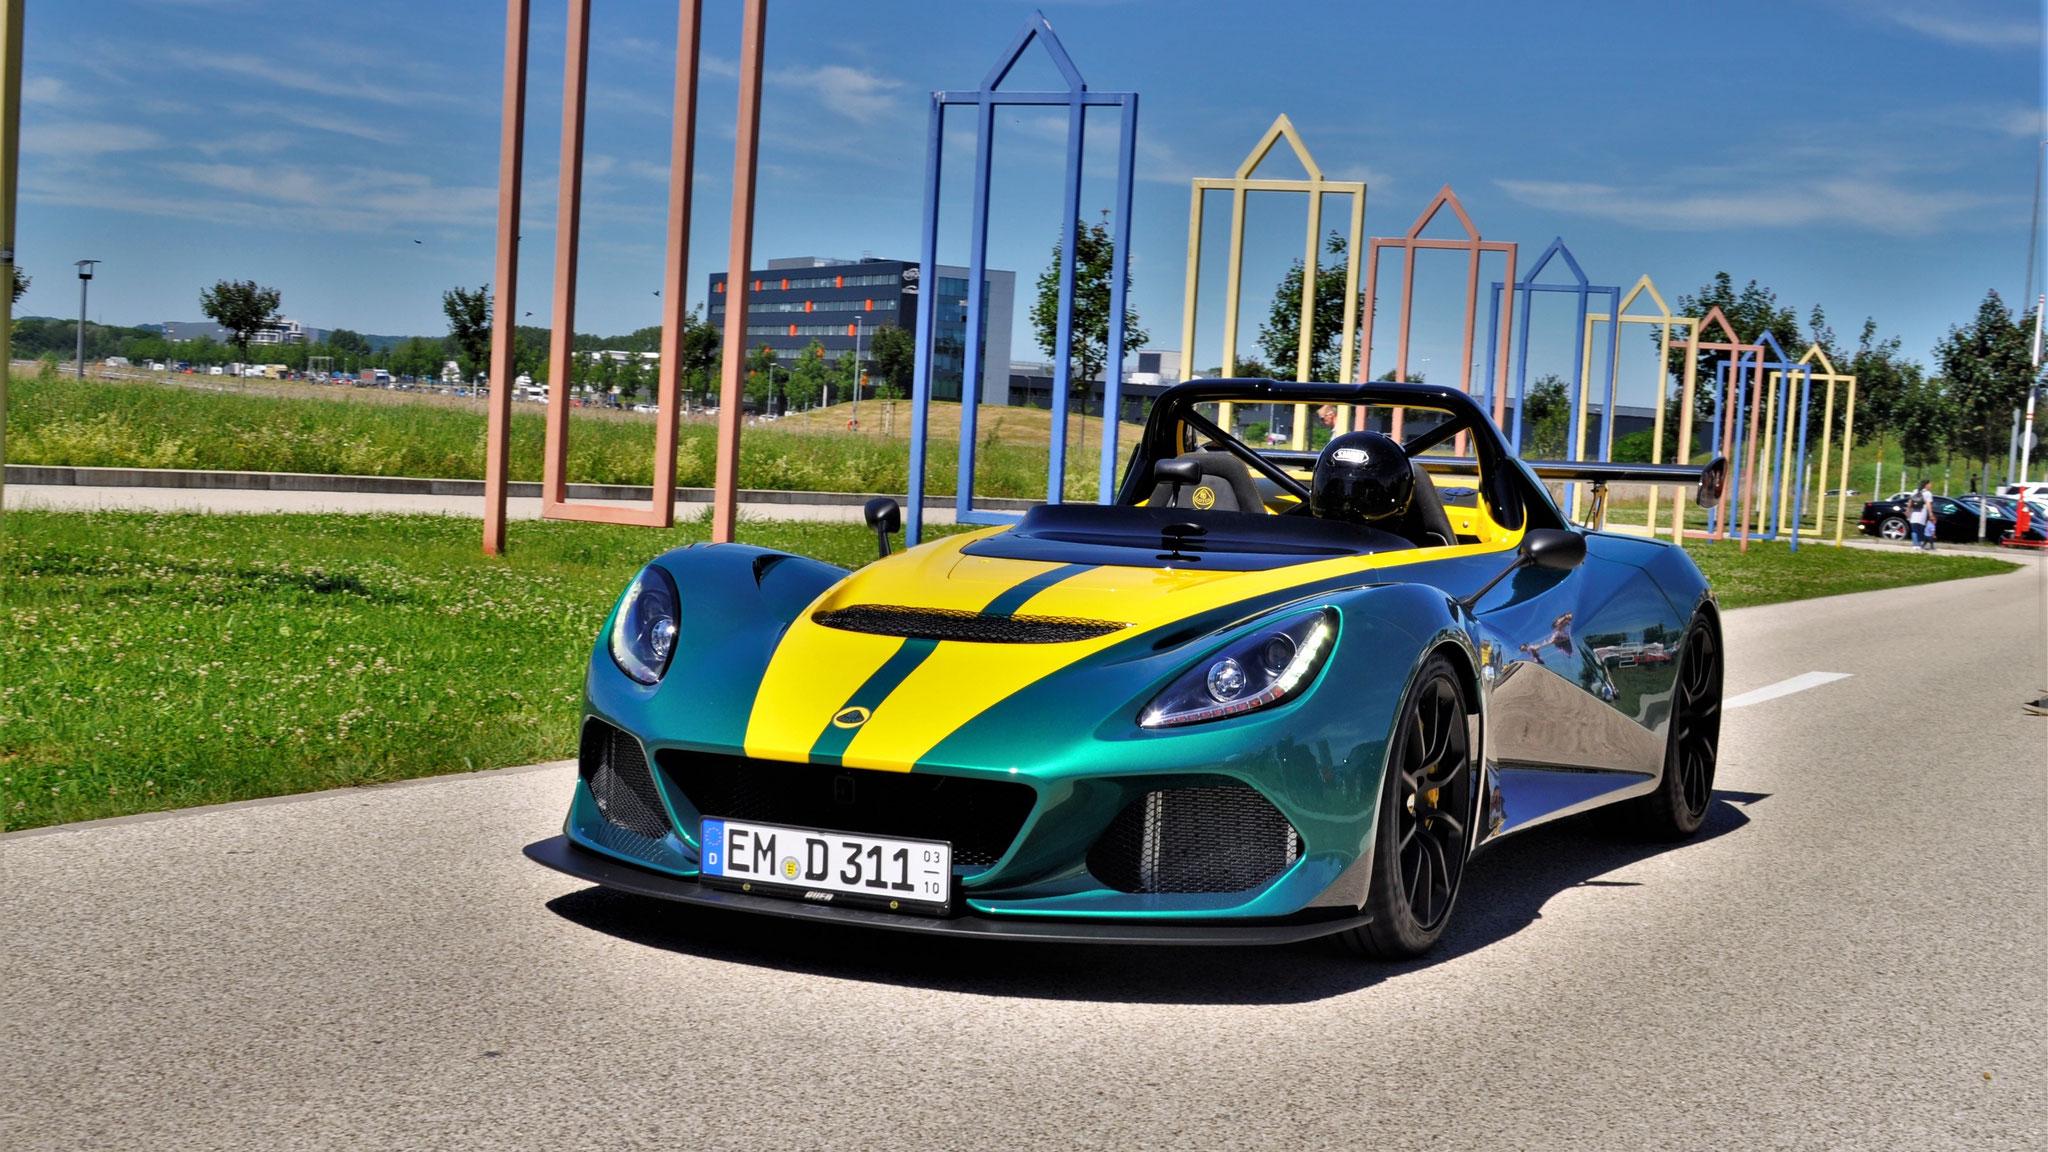 Lotus 3eleven ( 1 of 311) - EM-D-311